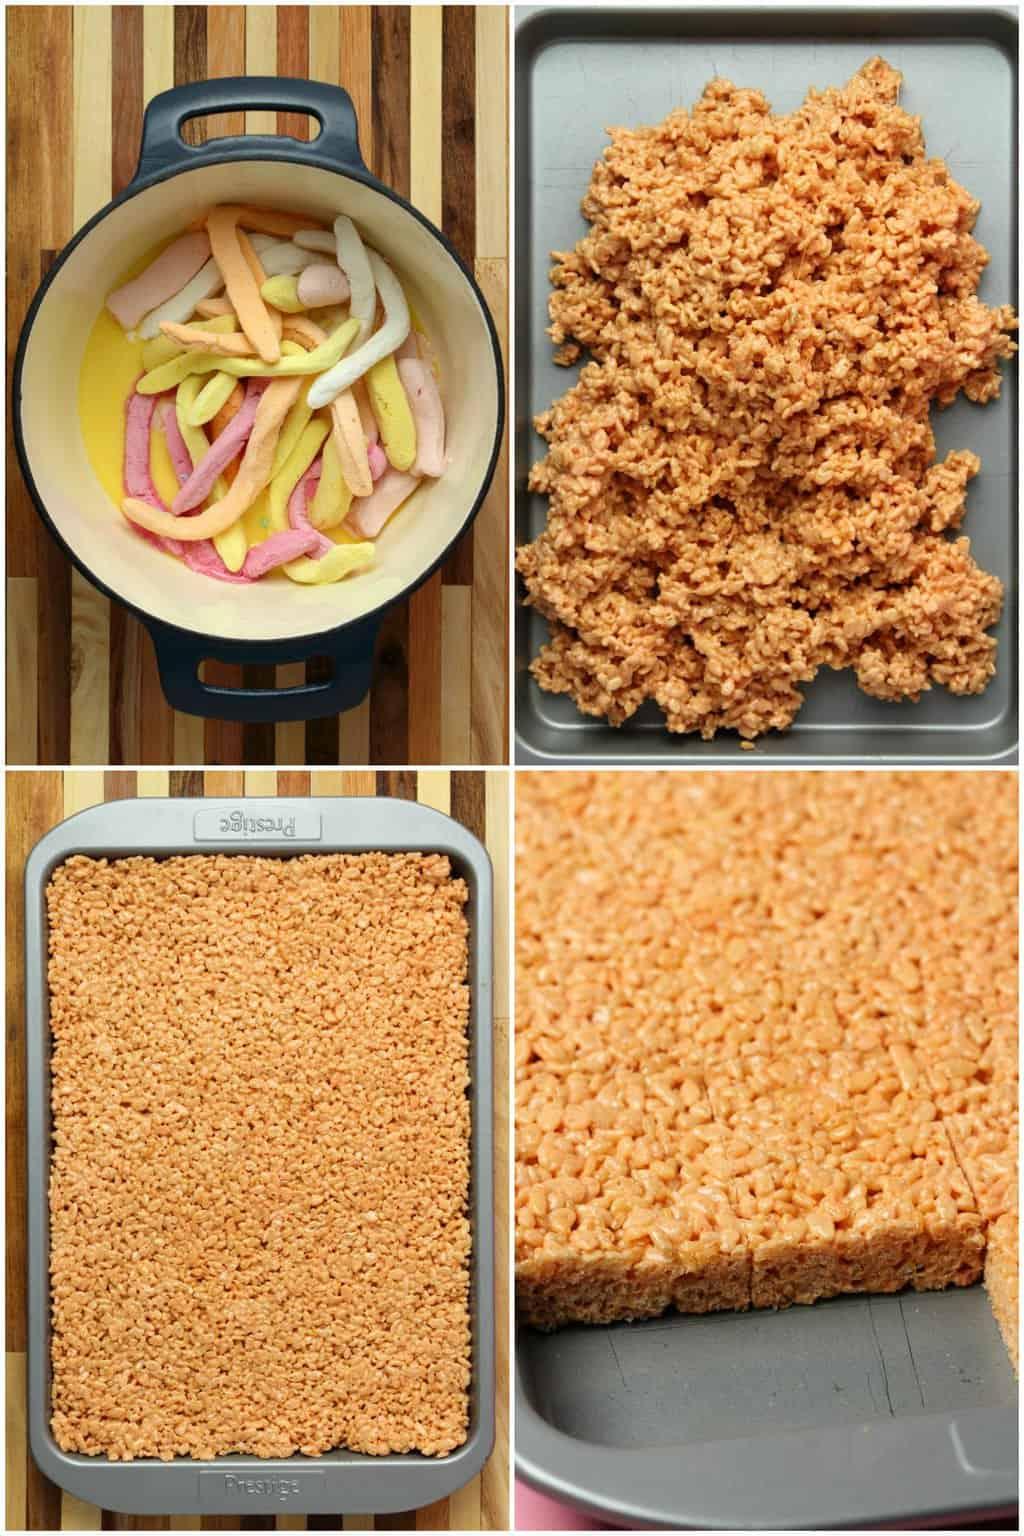 Step by step process photos of preparing vegan rice krispie treats.